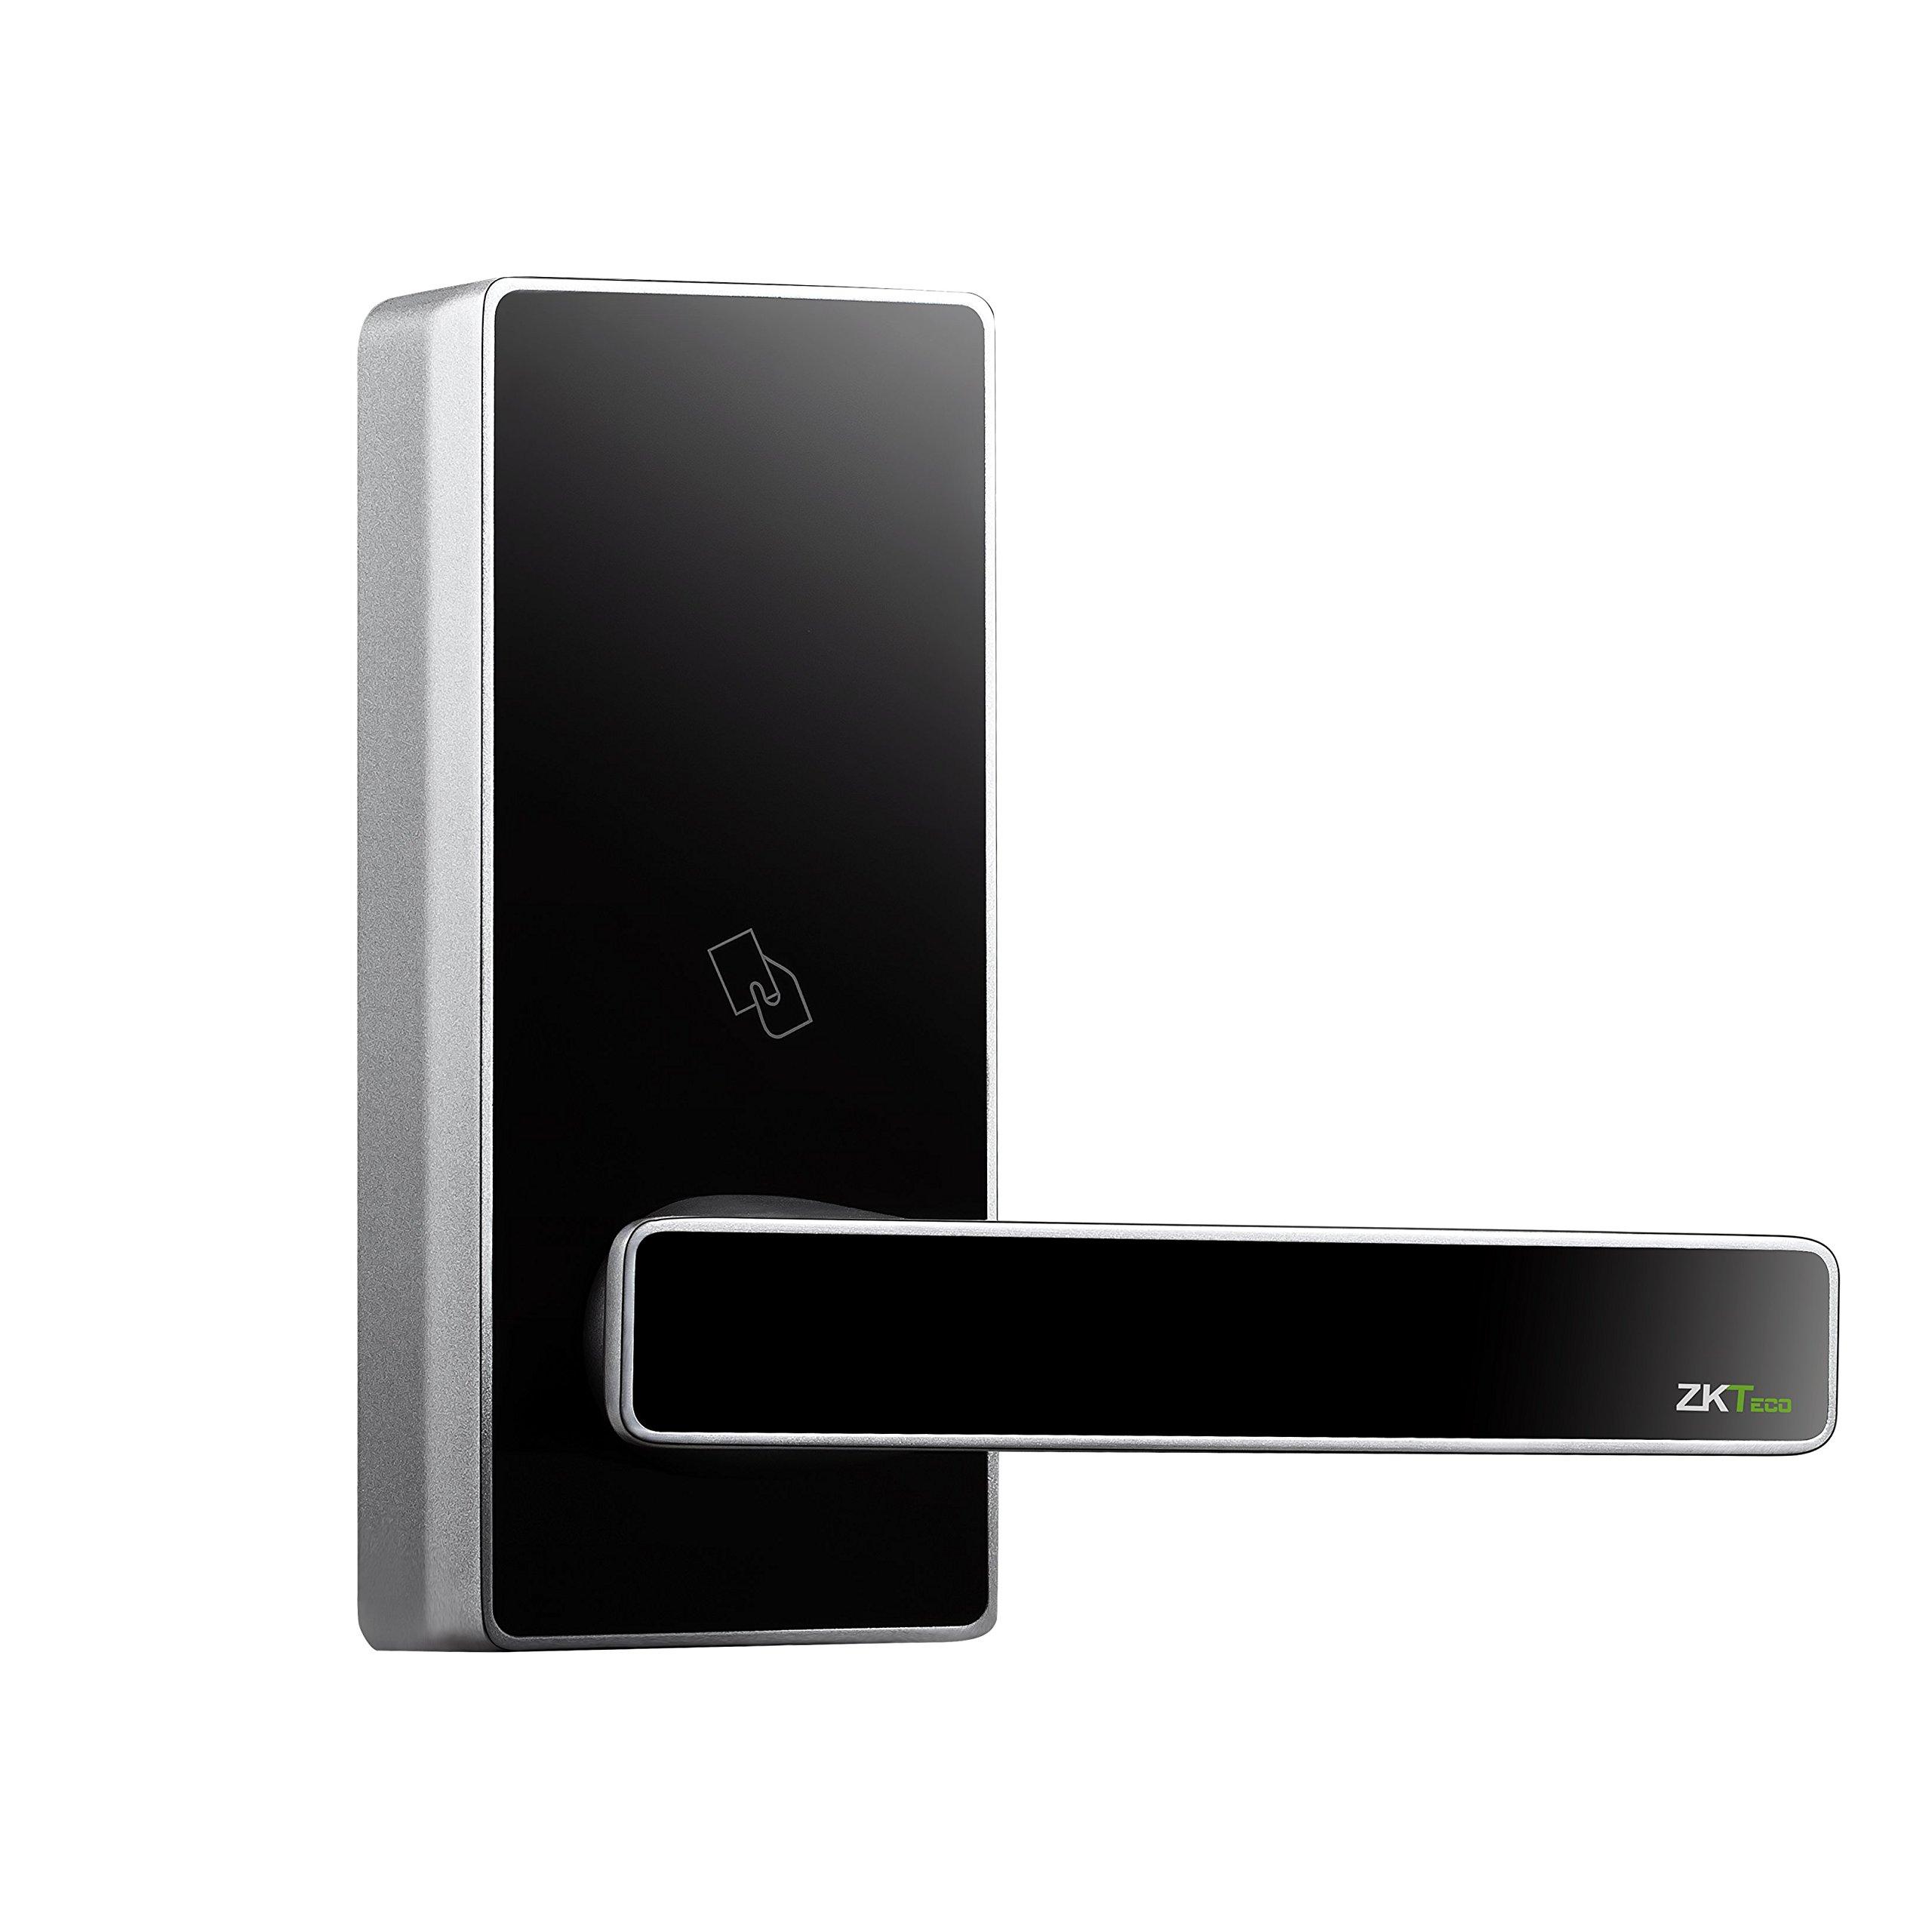 Bluetooth Locks Biometric Door Lock Keyless Smart Home Entry 5 pcs RFID Cards (Zinc Alloy).